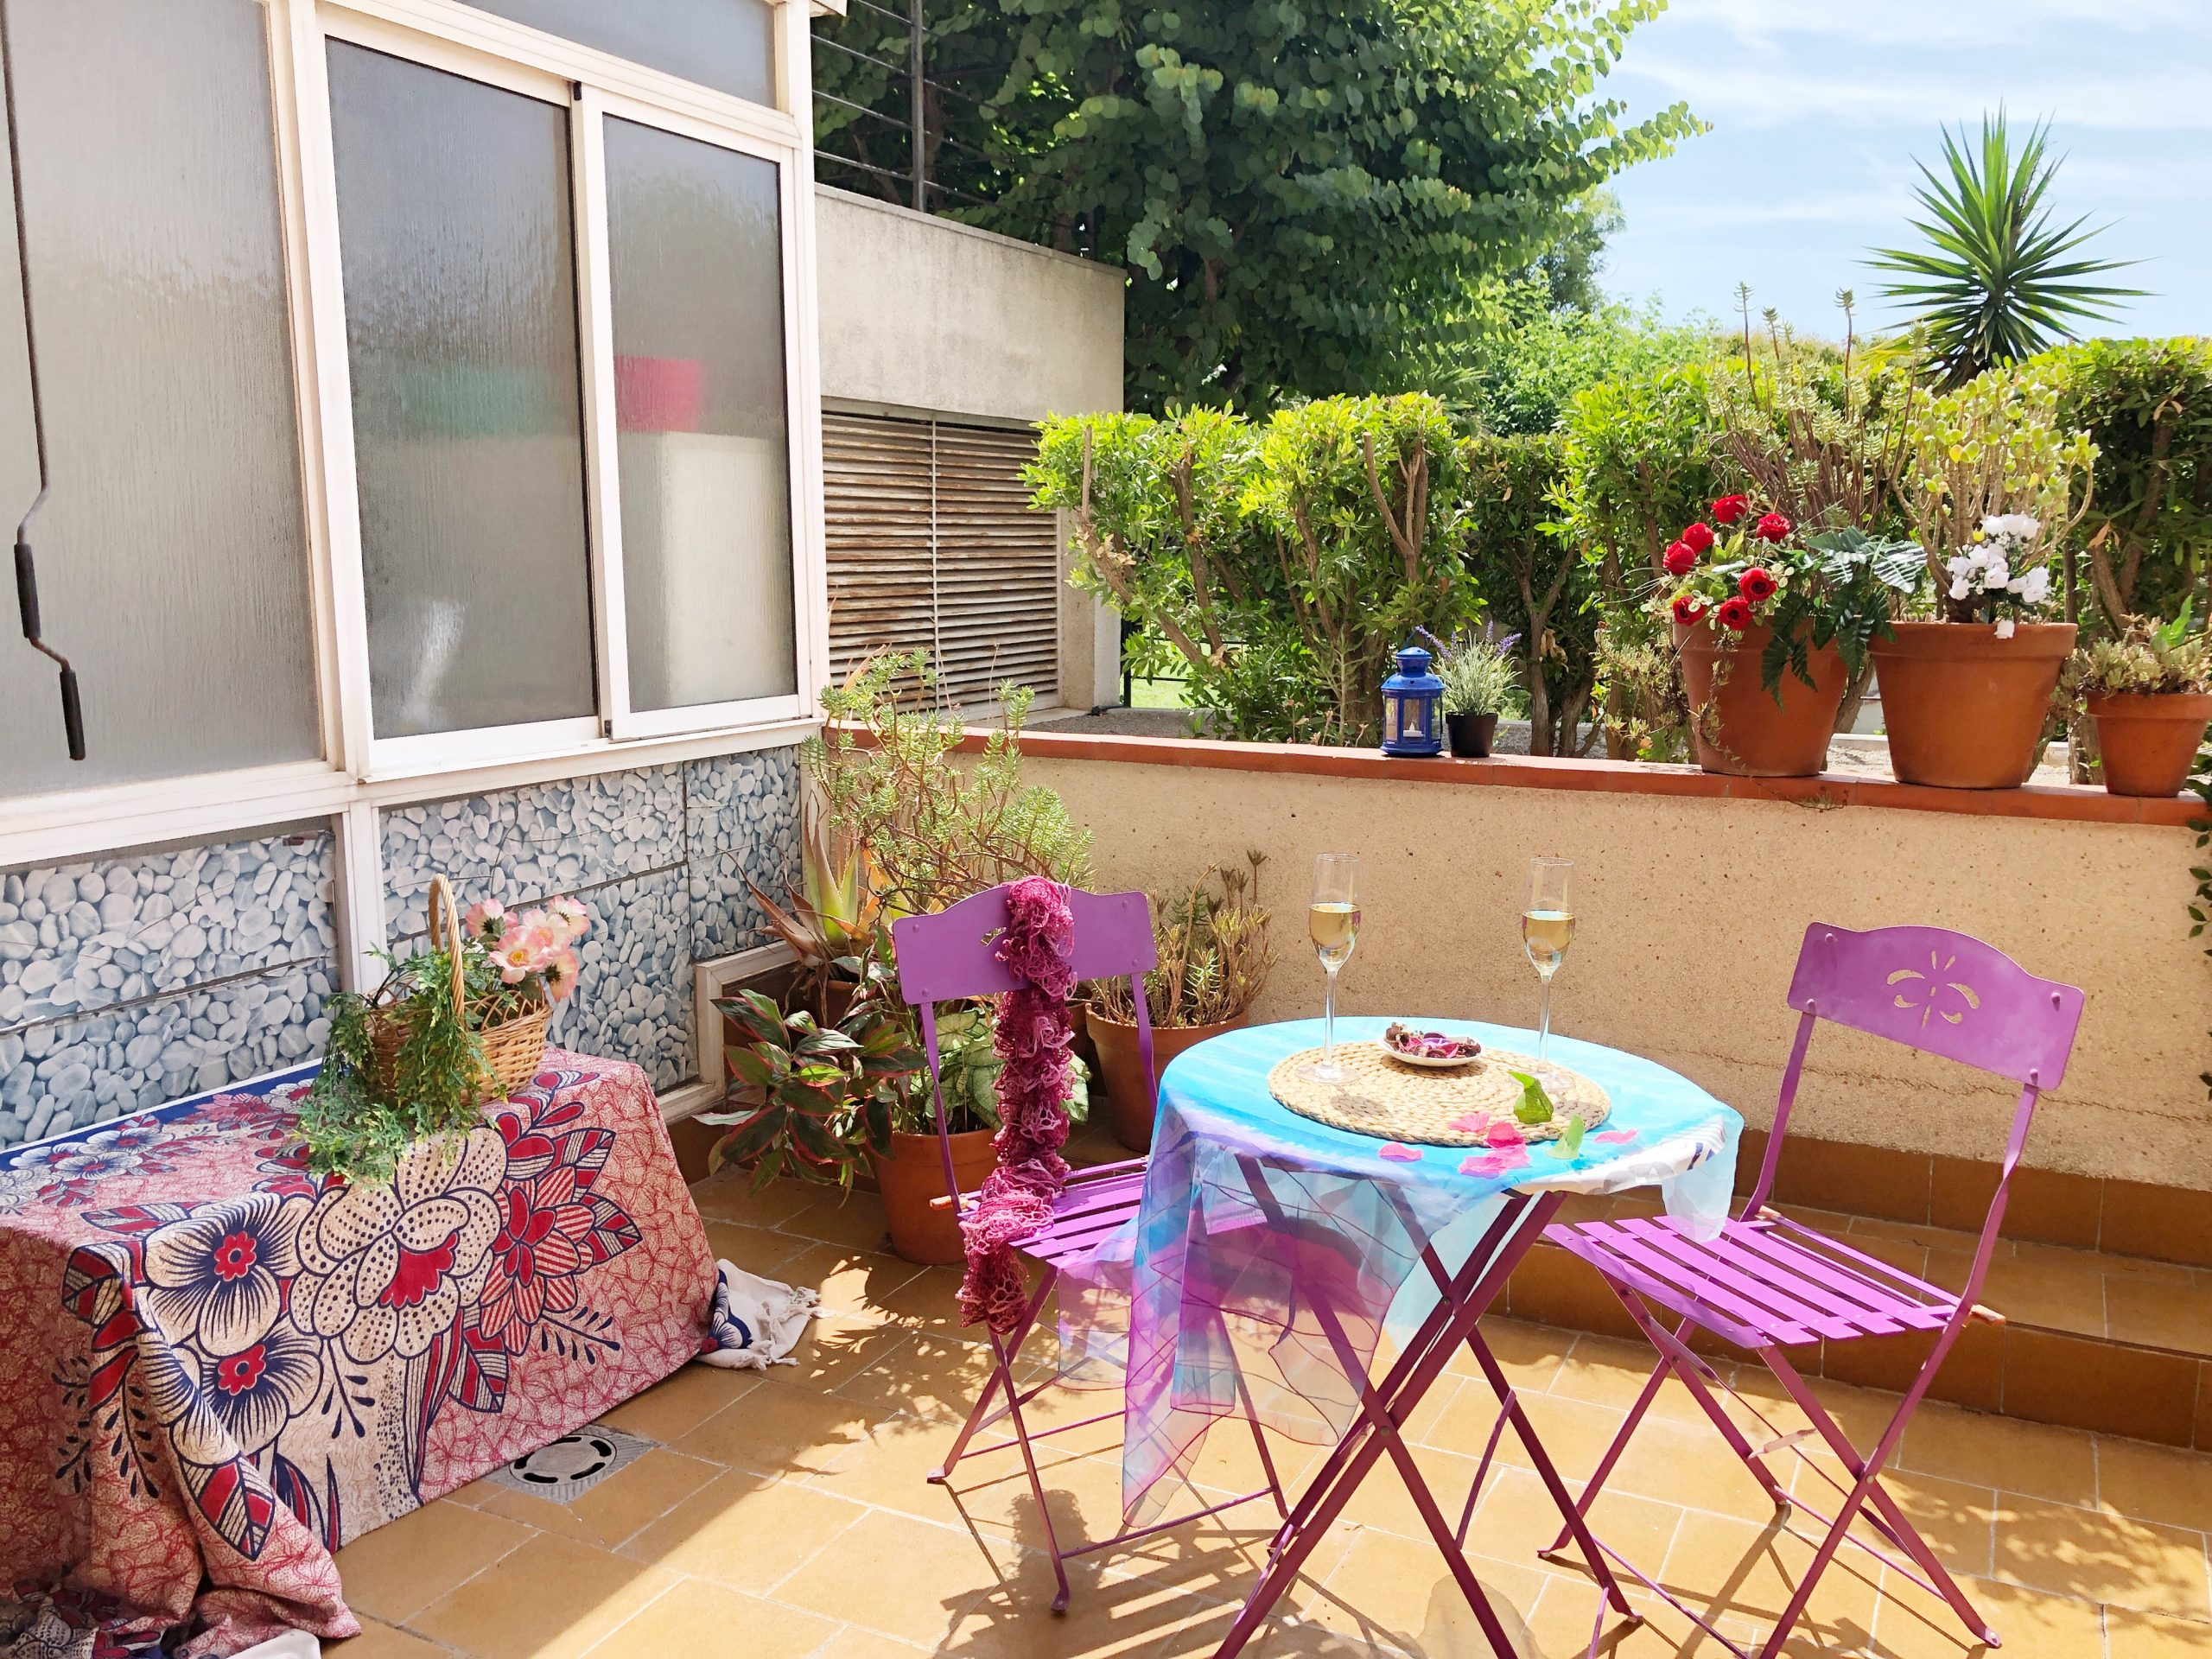 Piso de 4h con terraza y zona comunitaria con piscina